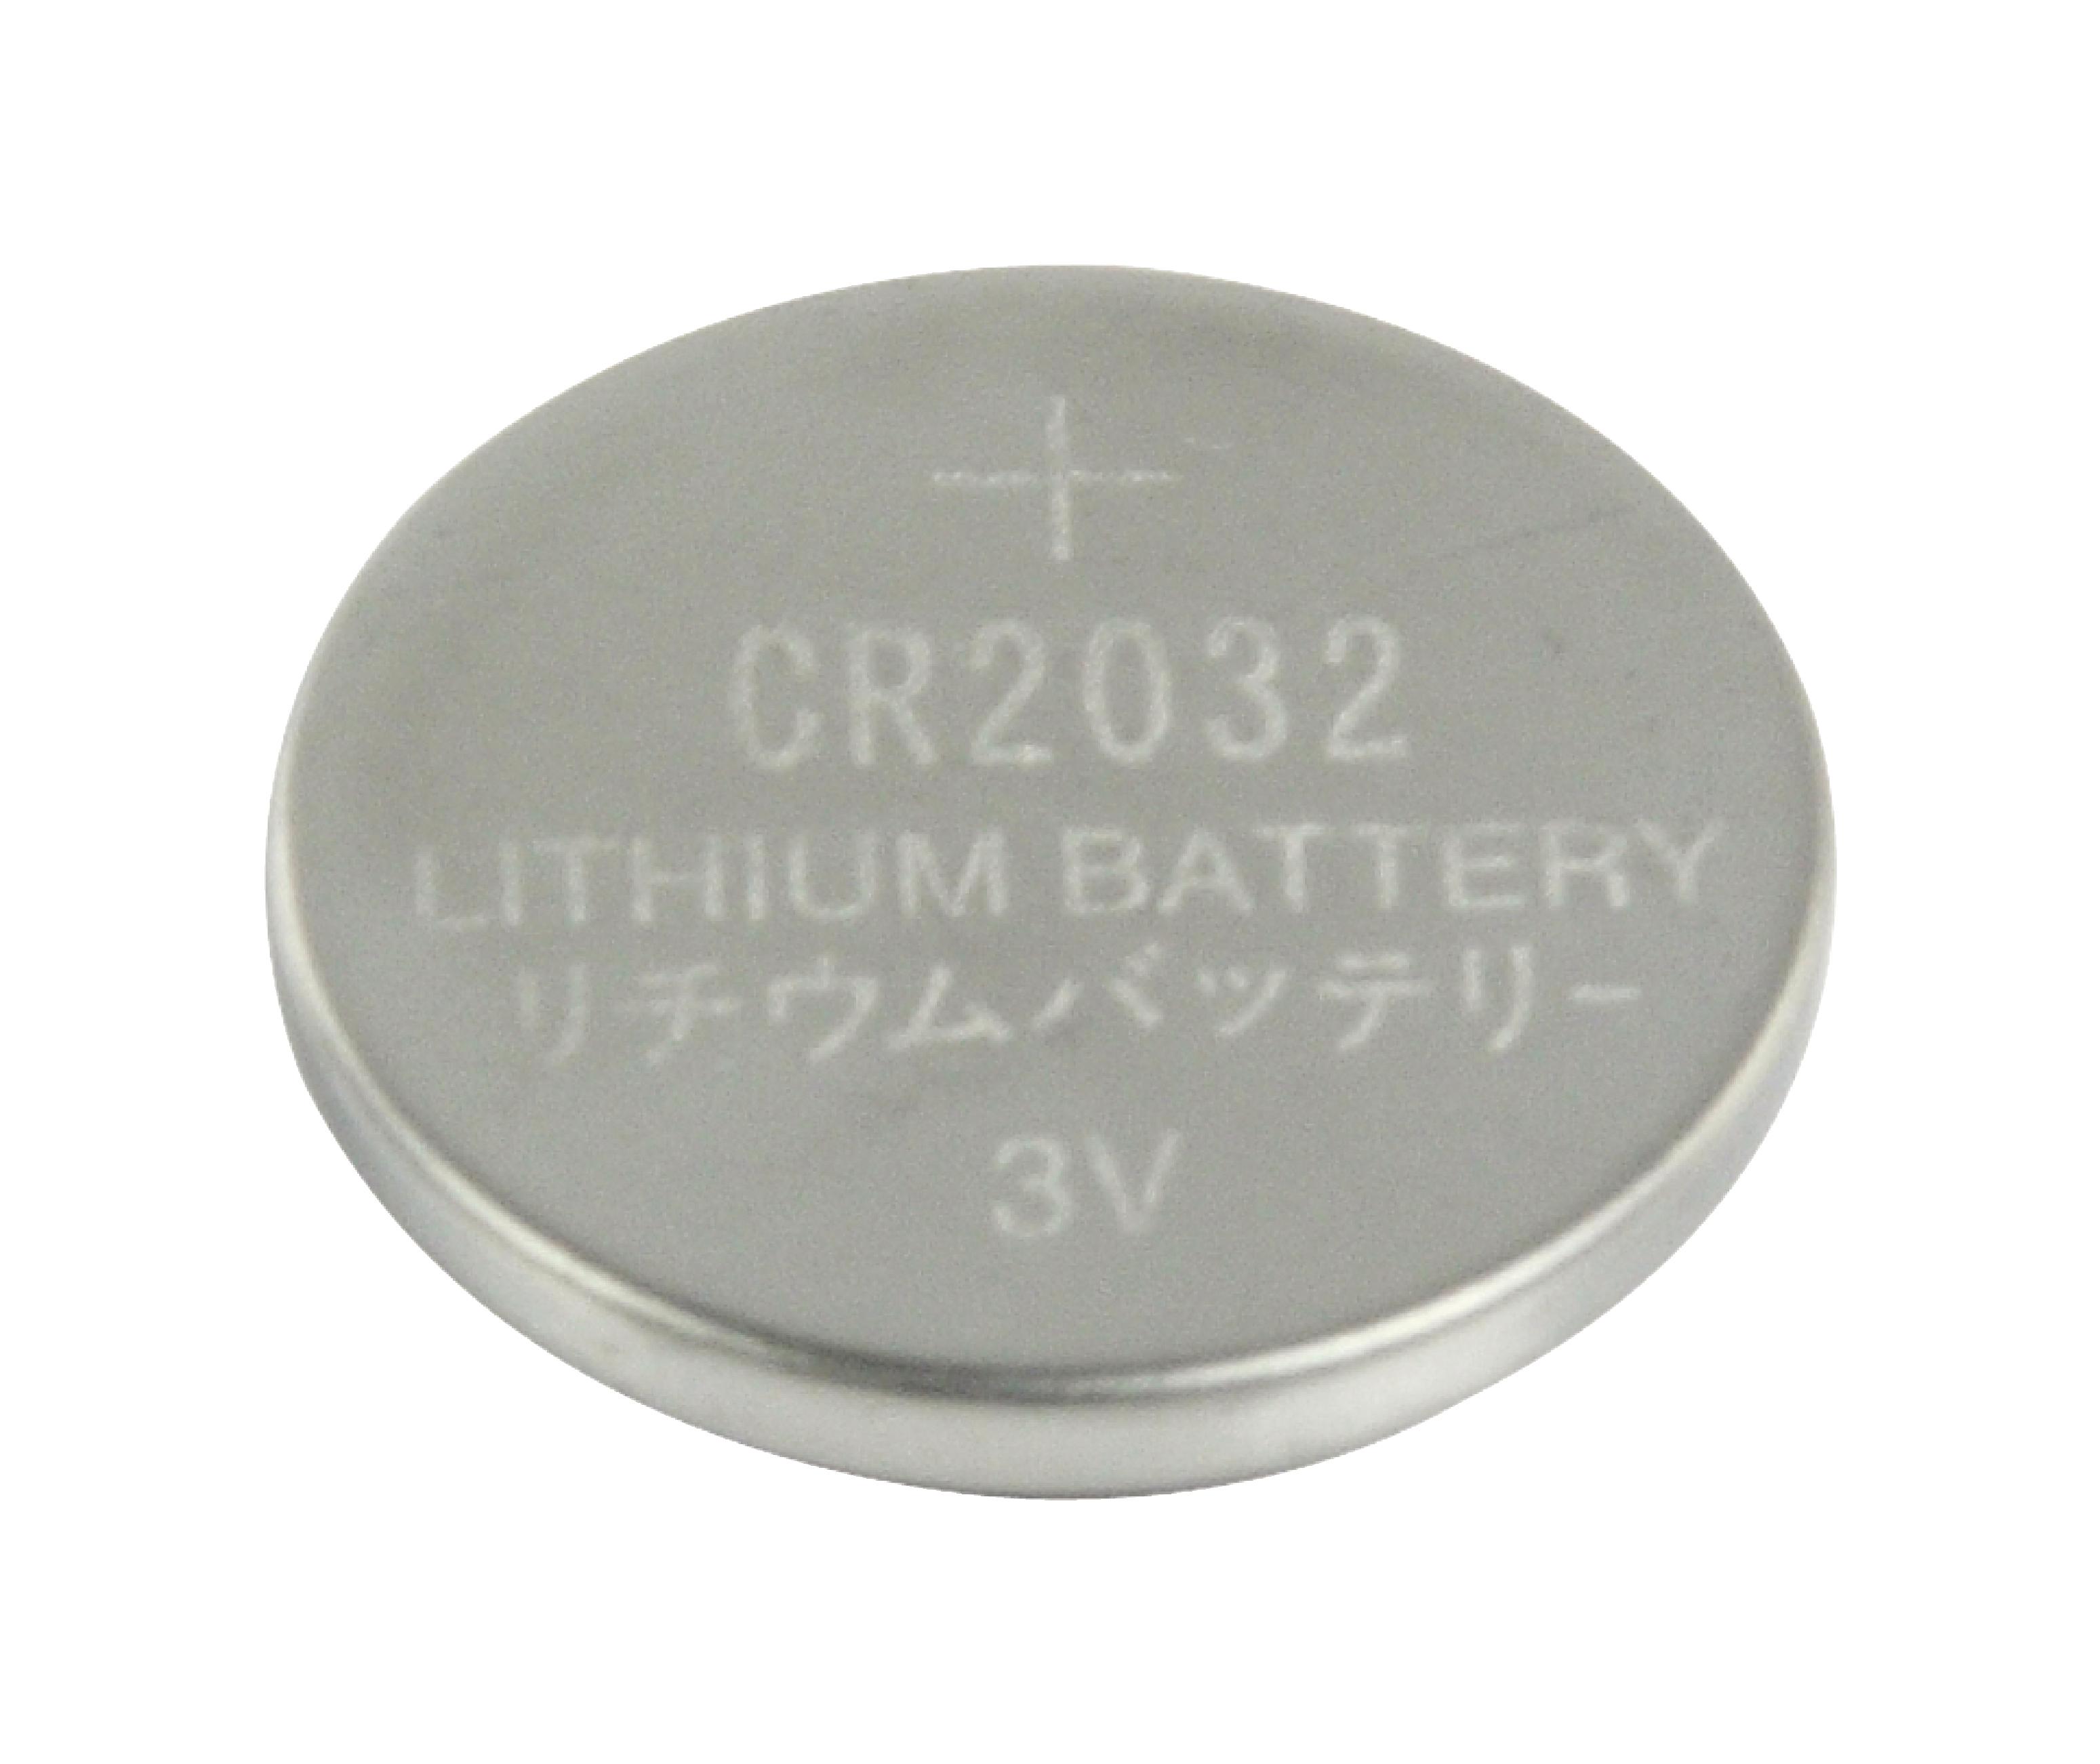 hq cr2032 hq cr2032 lithium battery 3 v 200 mah 5. Black Bedroom Furniture Sets. Home Design Ideas